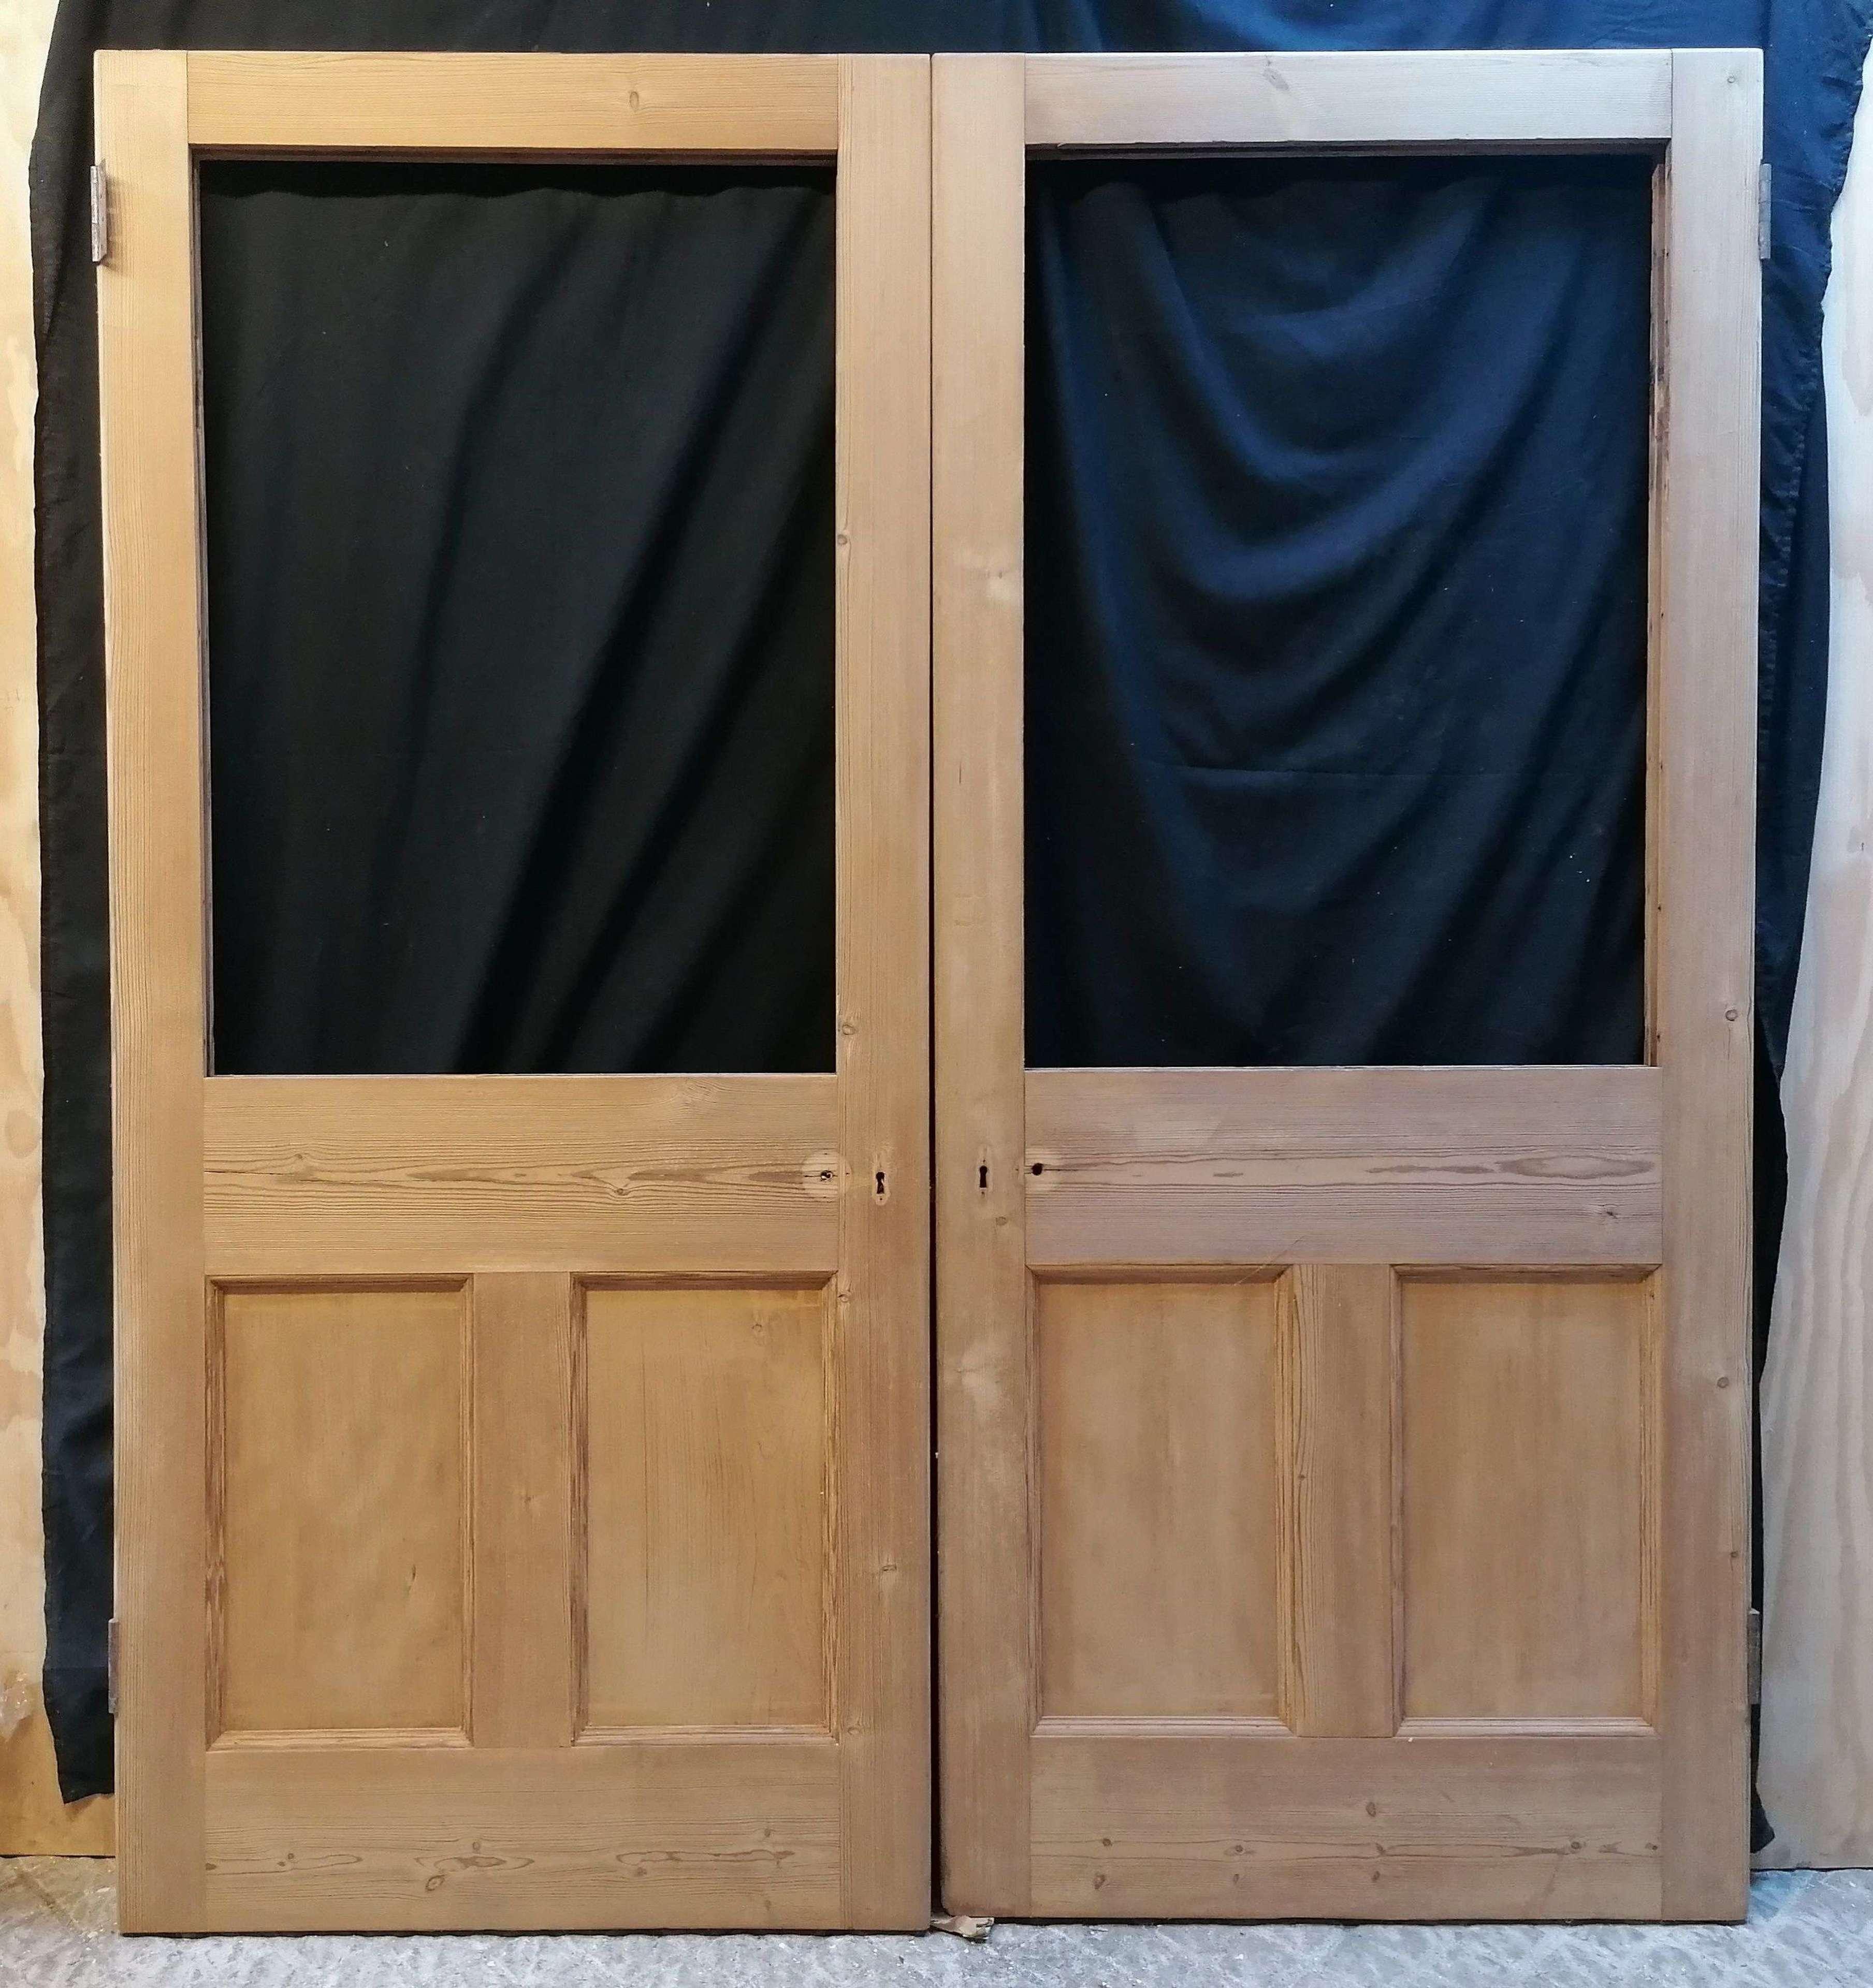 DP0338 A PAIR OF RECLAIMED VICTORIAN INTERNAL STRIPPED PINE DOORS